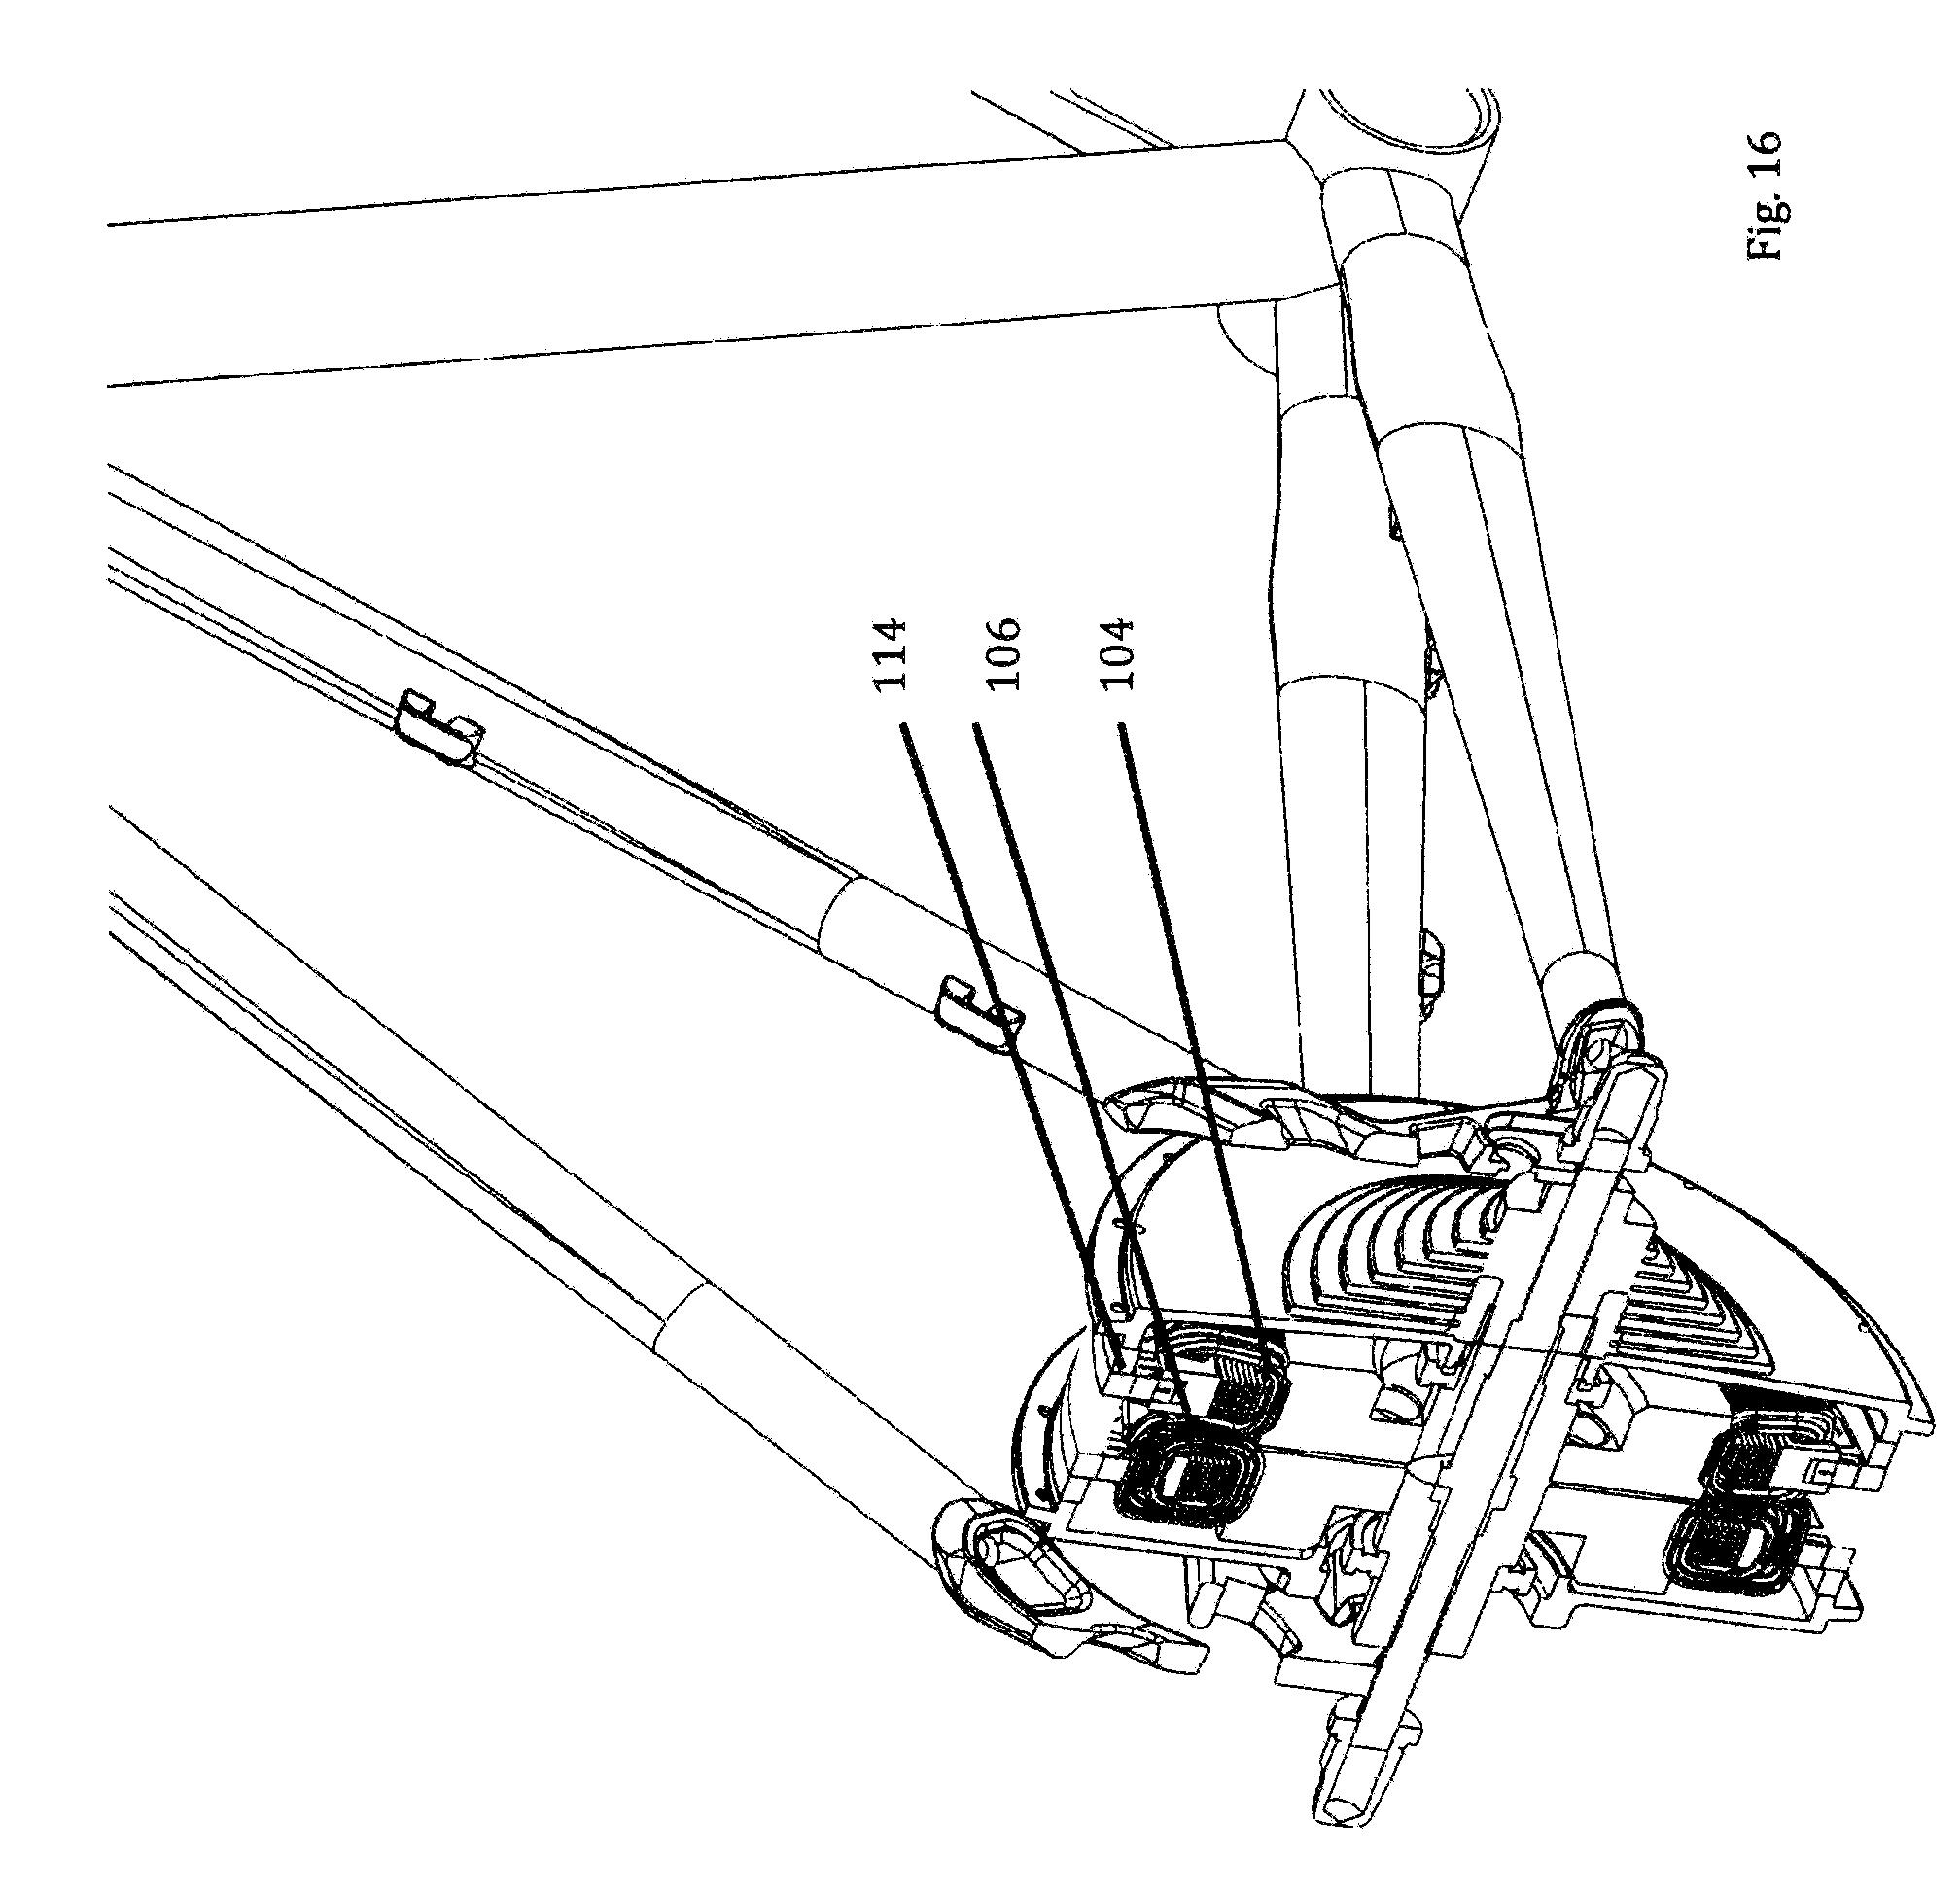 Motor Coil Winding | Wiring Diagram Database